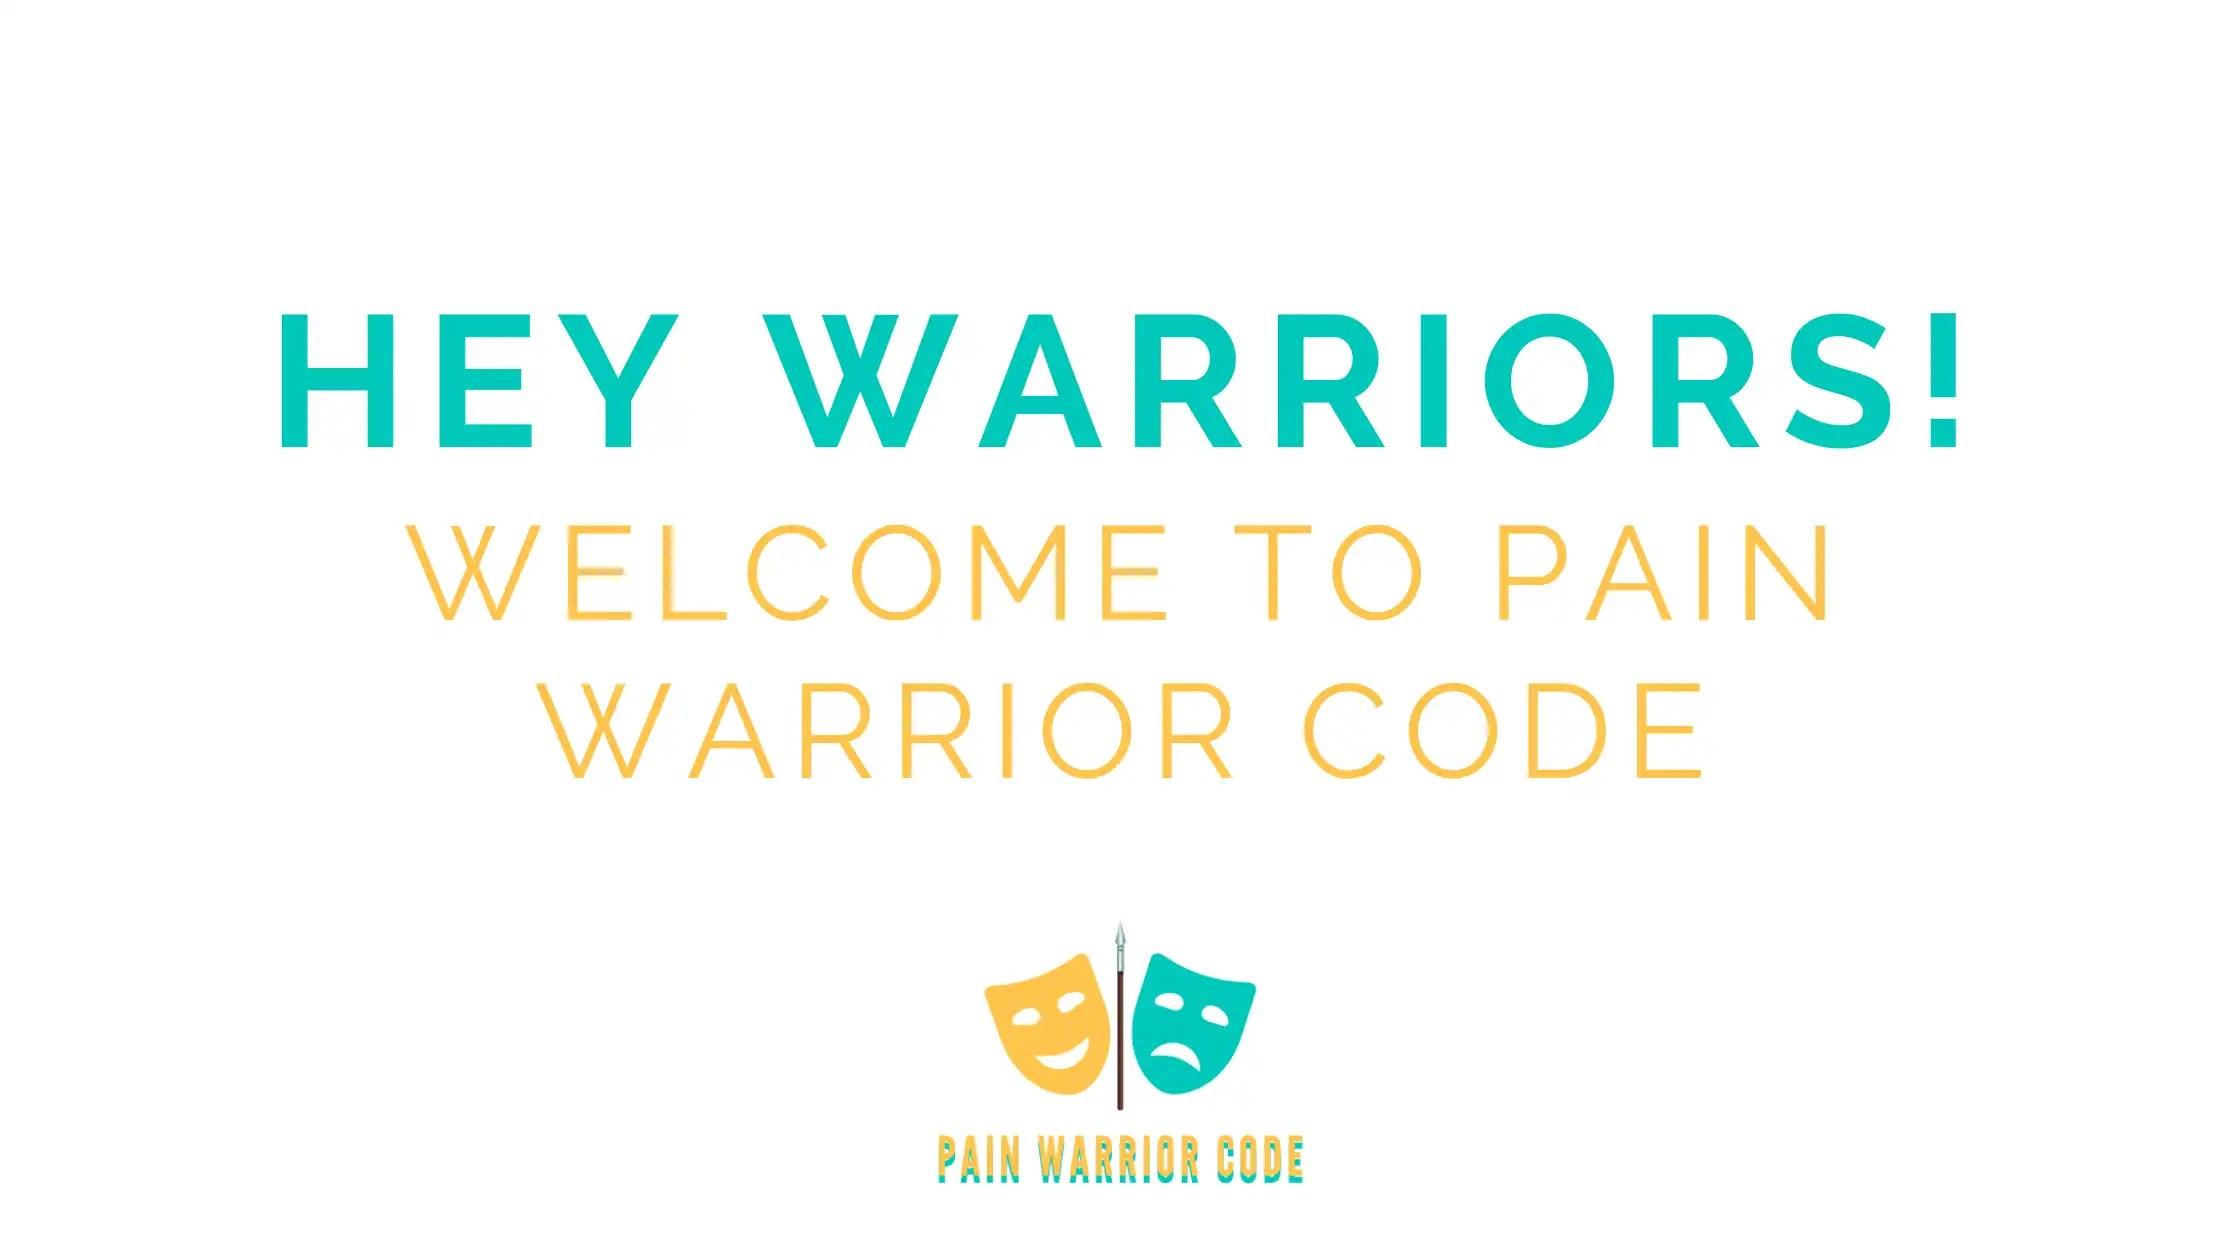 Hey Warriors! Welcome to Pain Warrior Code Title